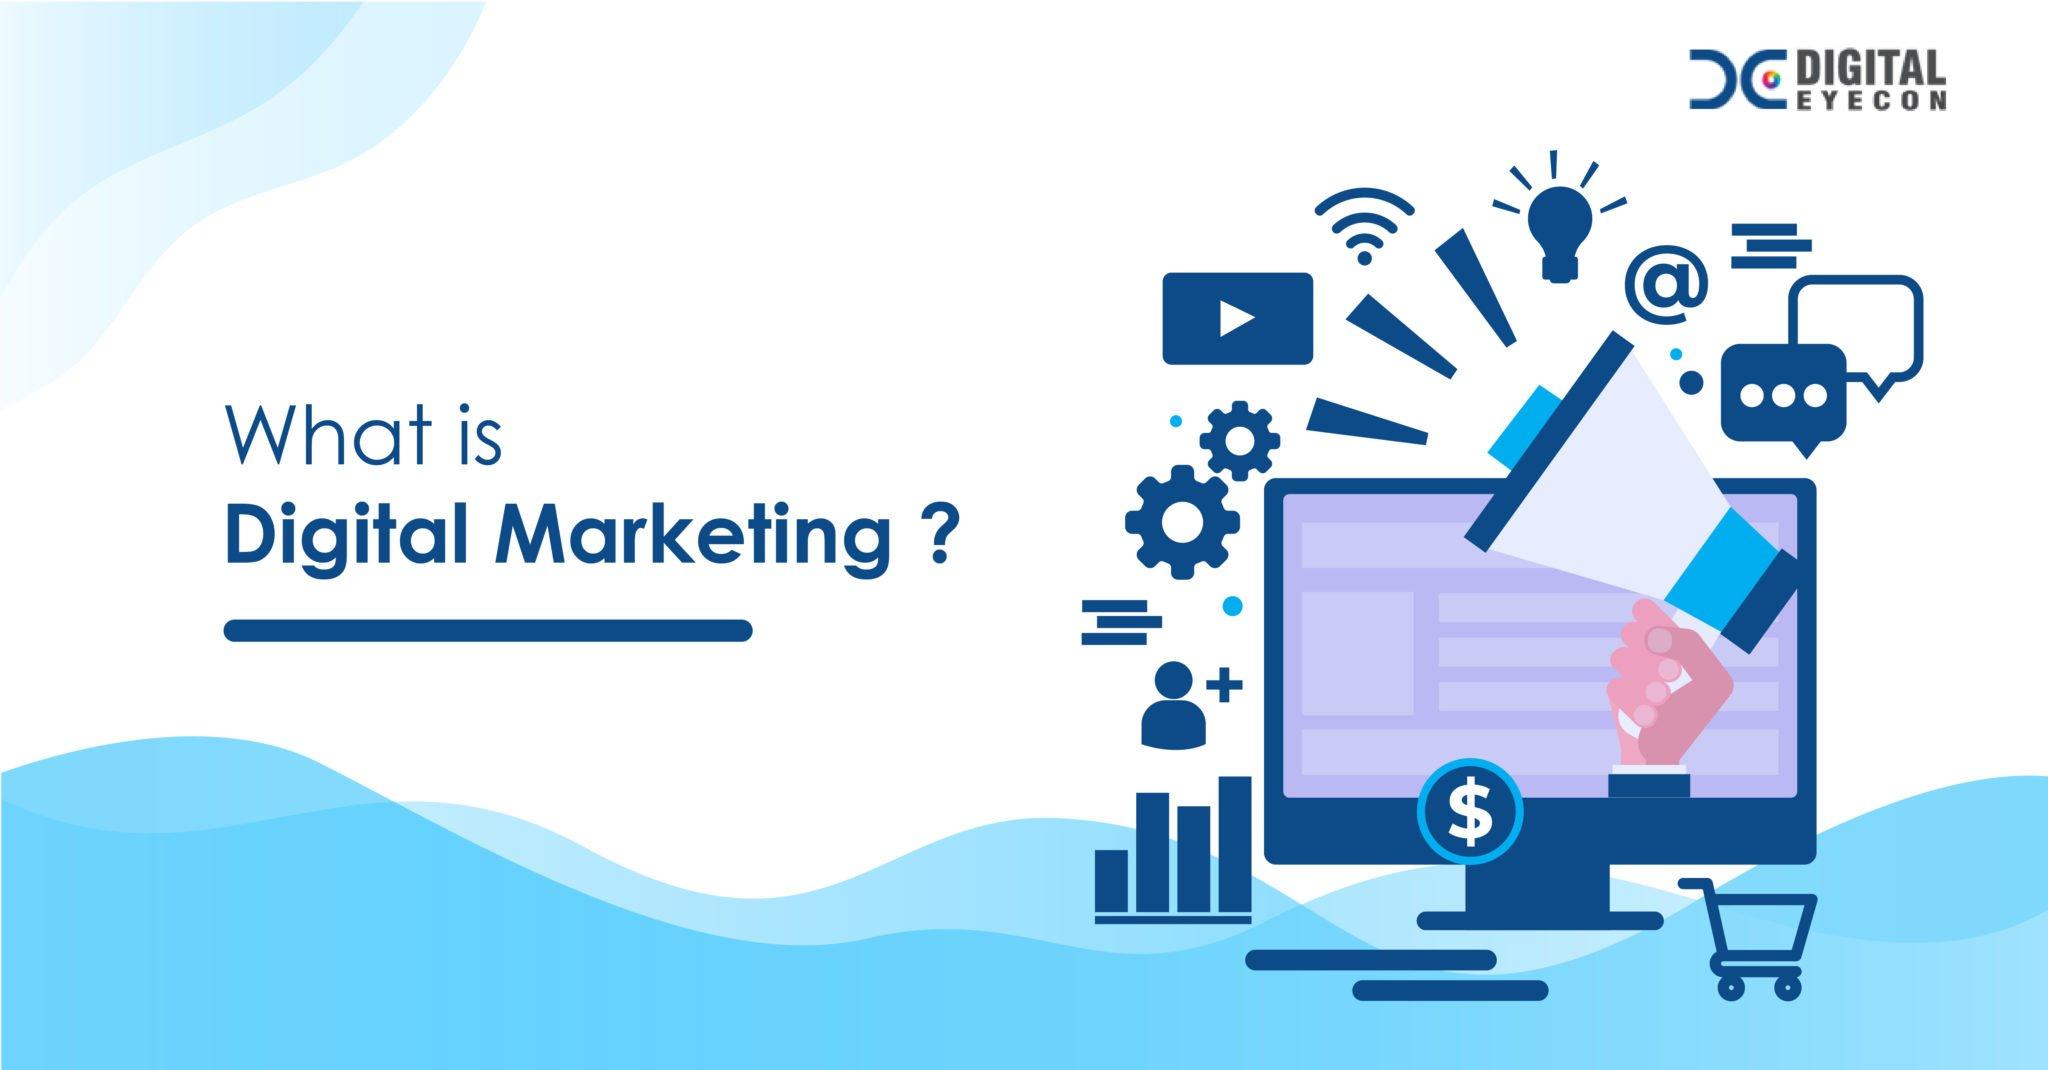 Digital Marketing Benefits